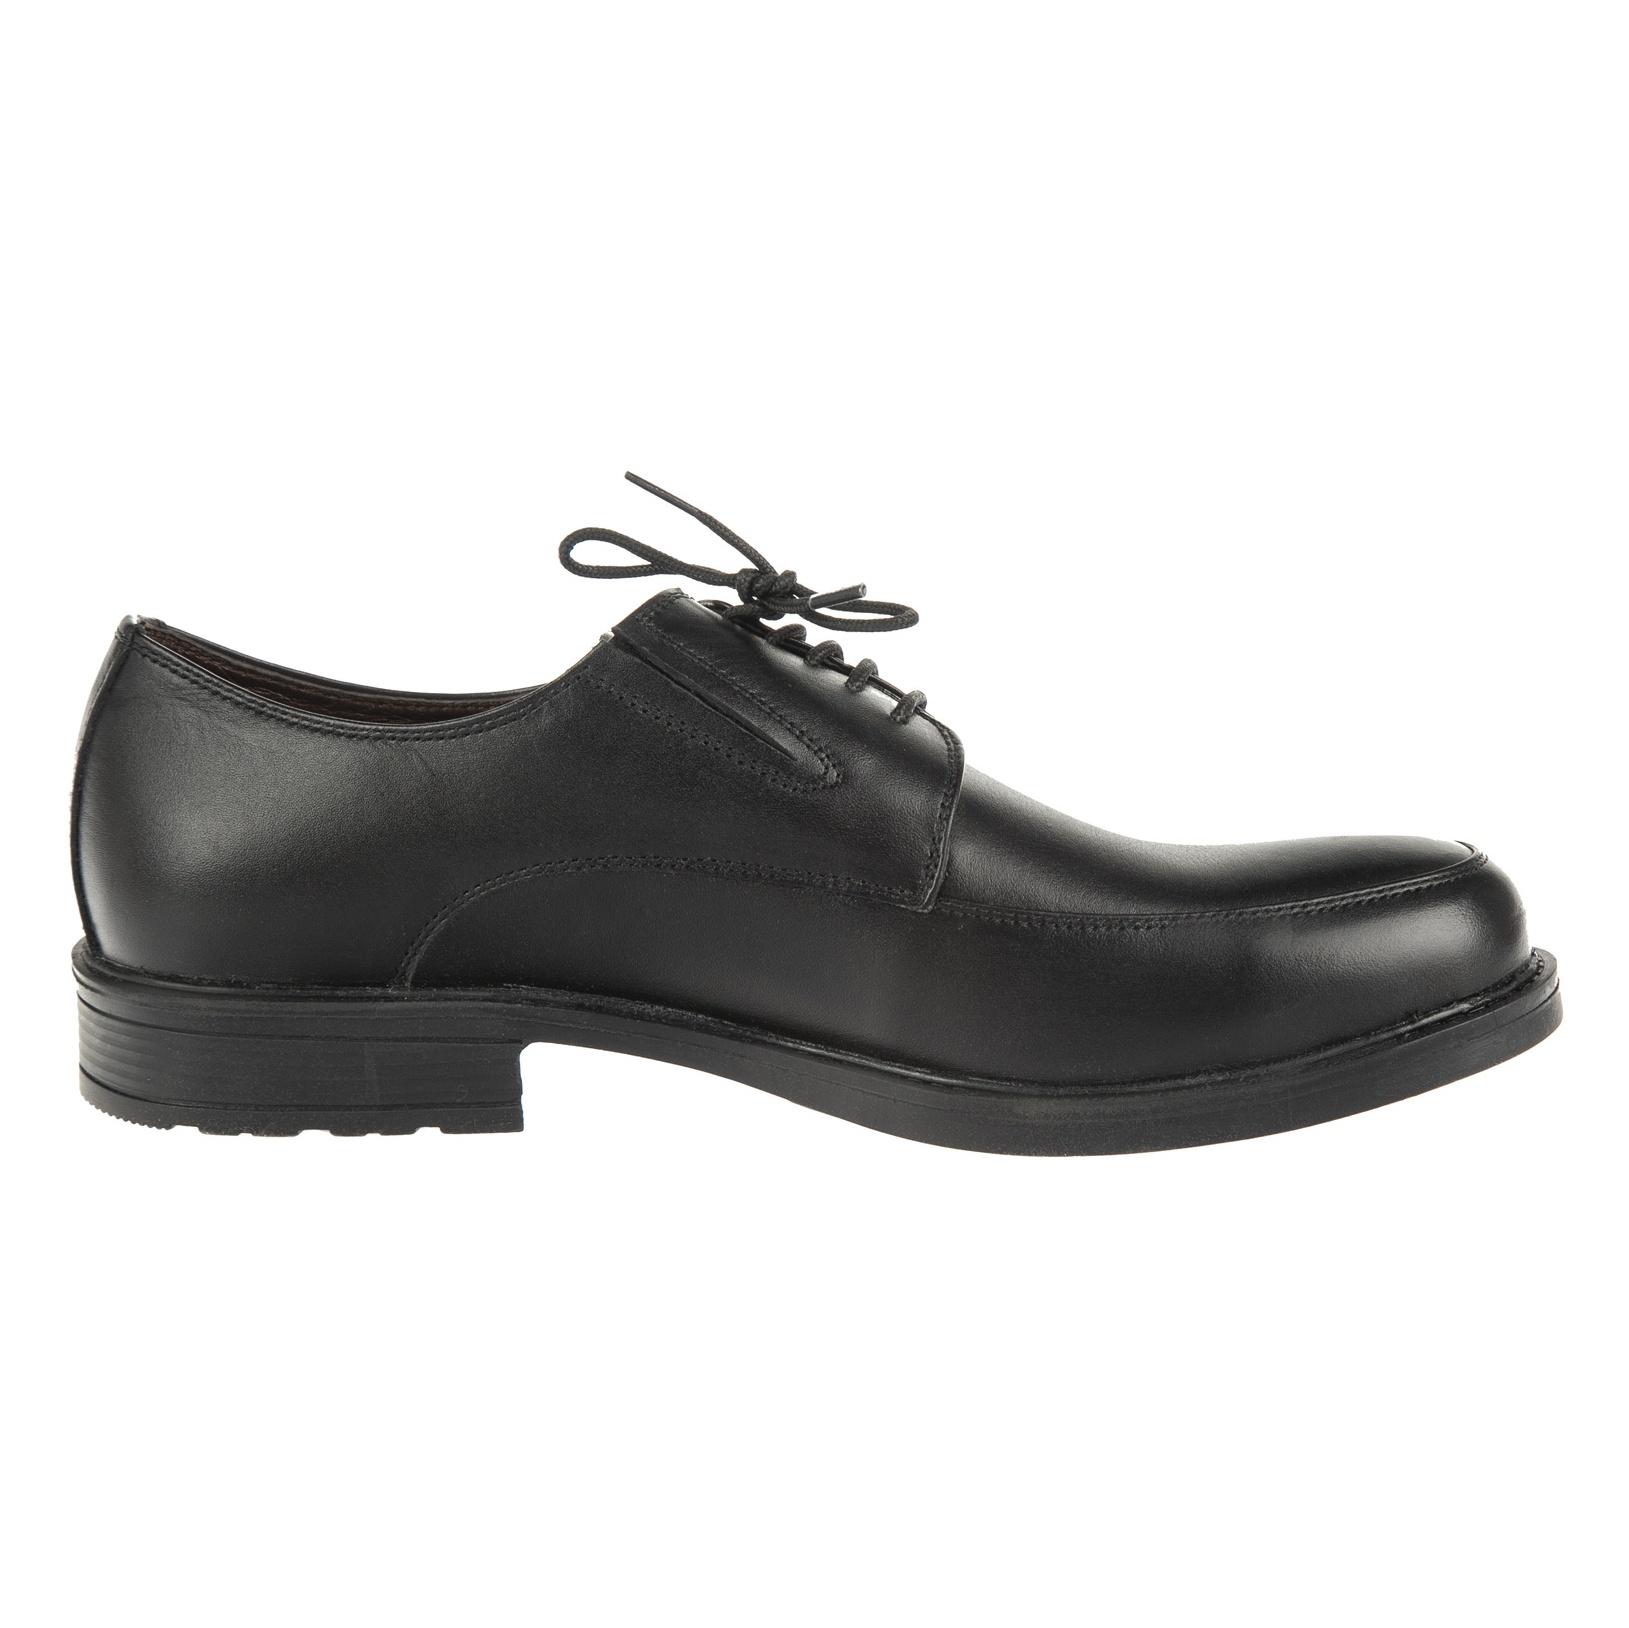 کفش مردانه بلوط مدل BT7138B-101